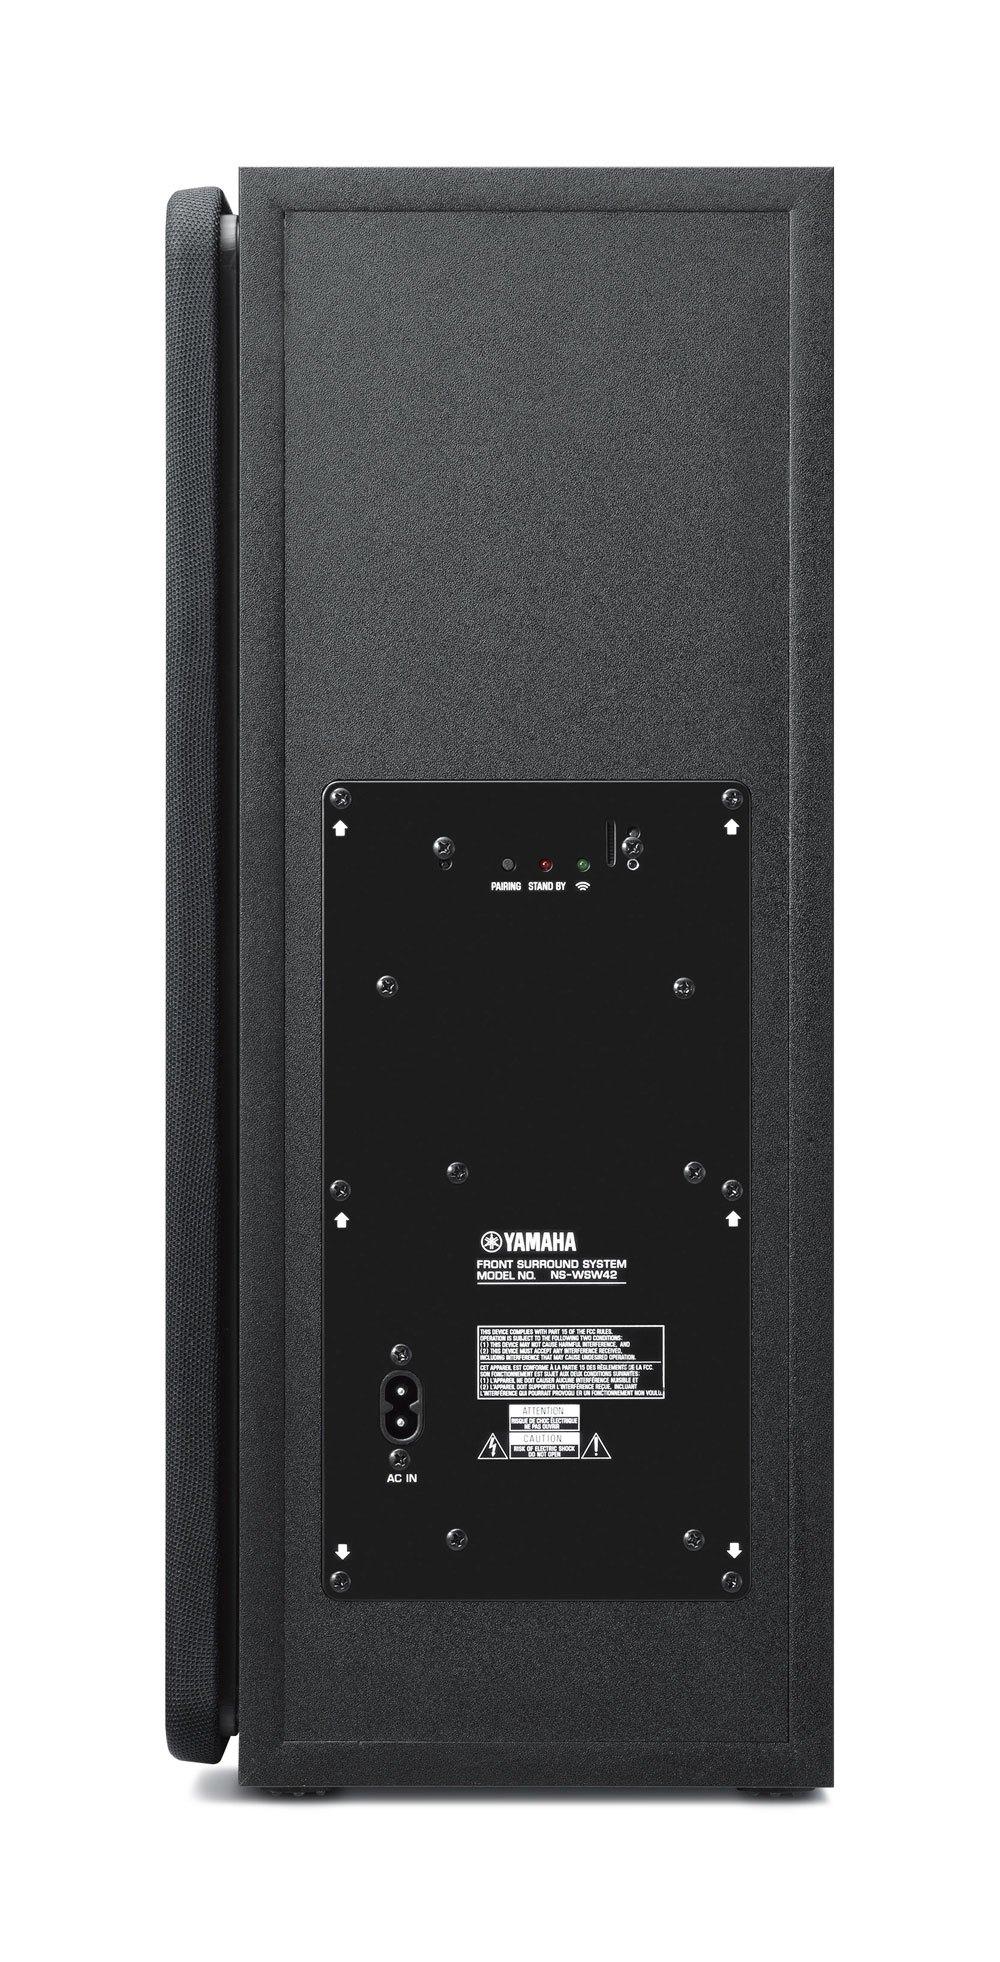 Descripción Barra de Sonido Yamaha YAS-207